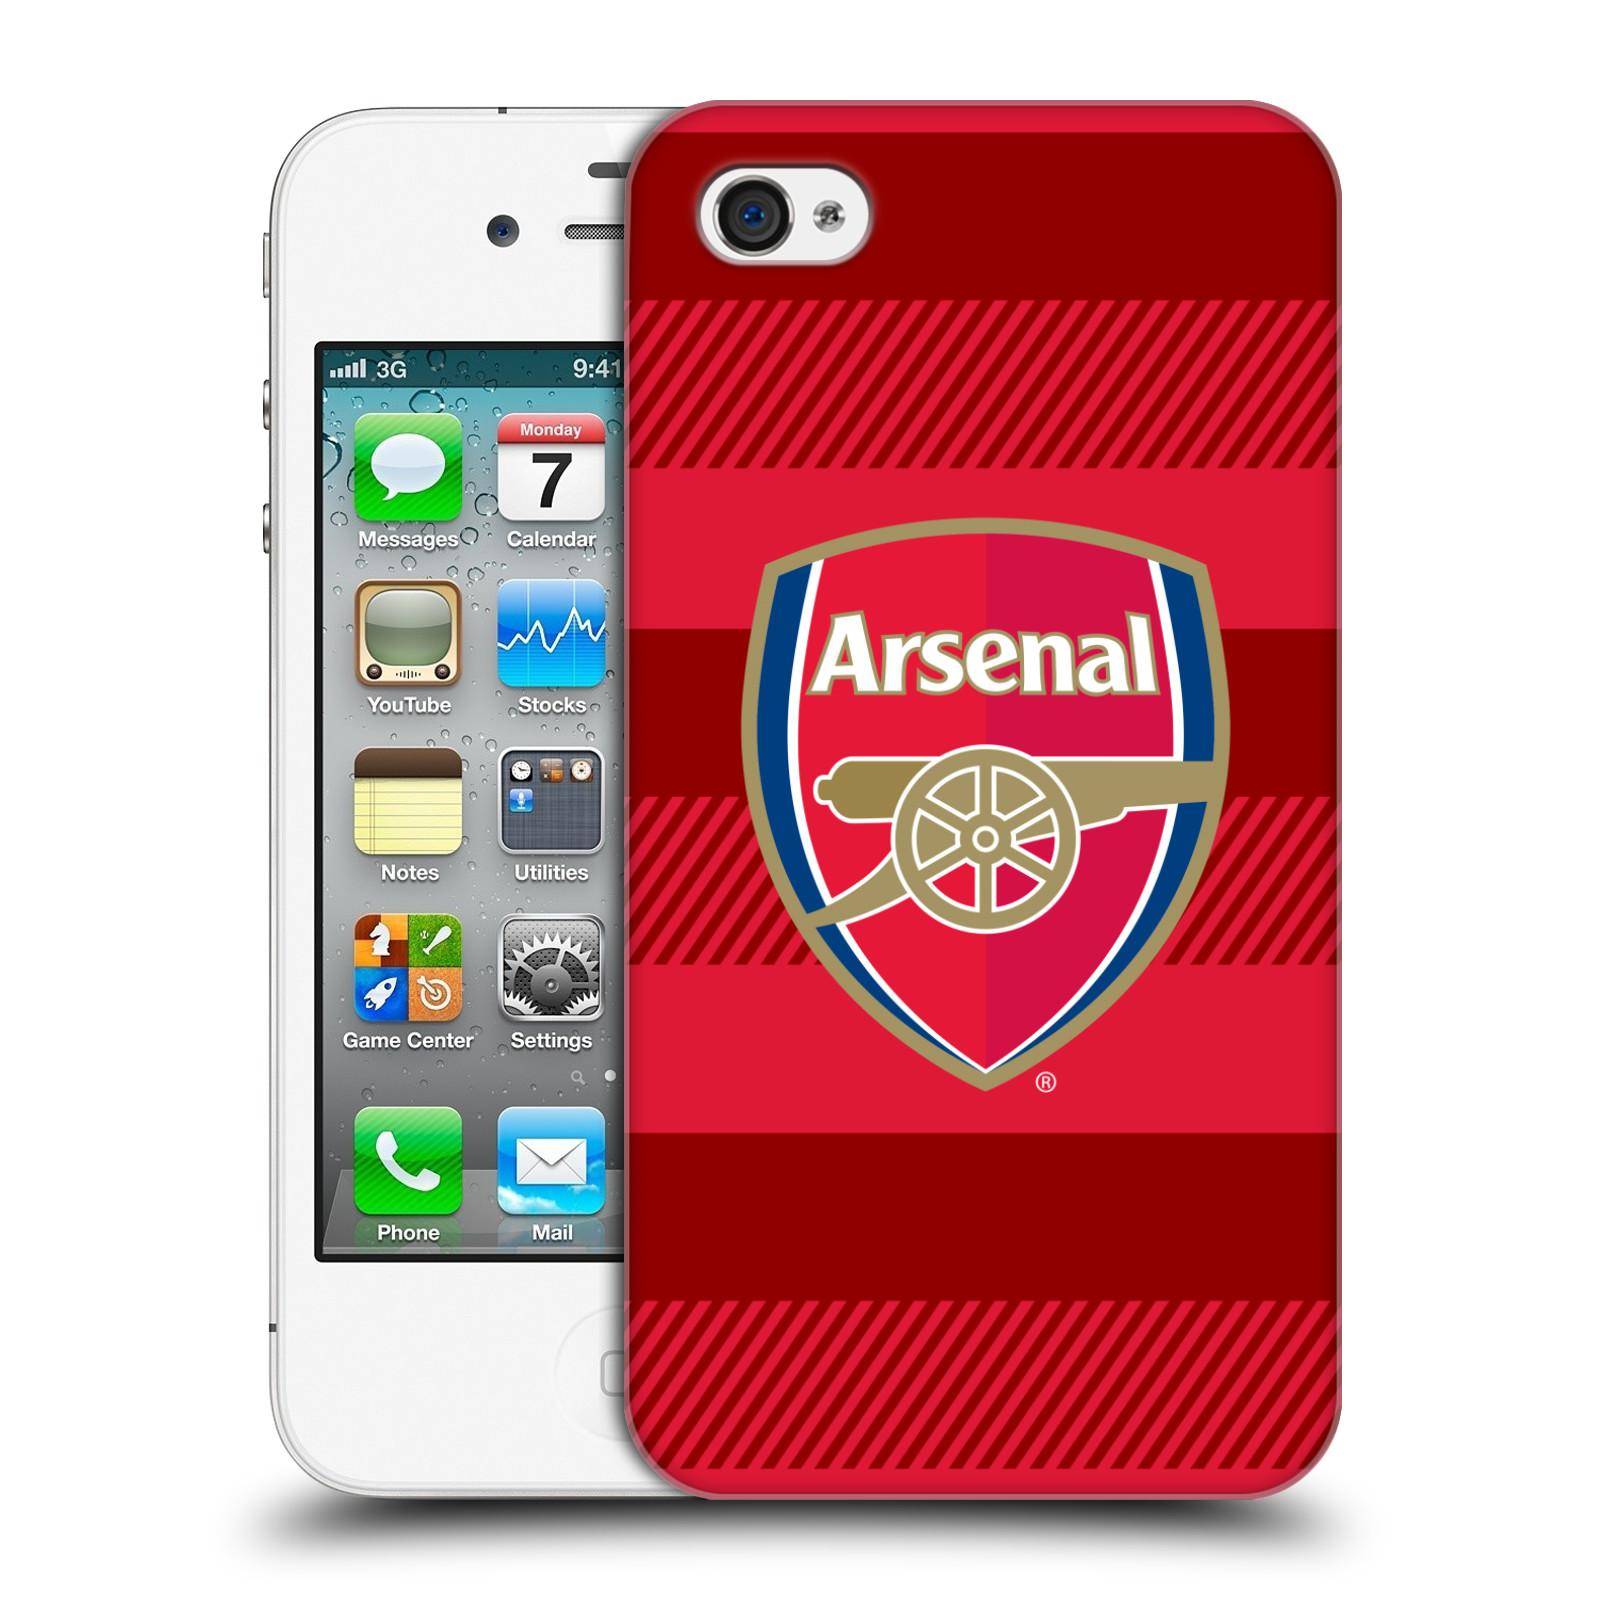 Plastové pouzdro na mobil Apple iPhone 4 a 4S - Head Case - Arsenal FC - Logo s pruhy